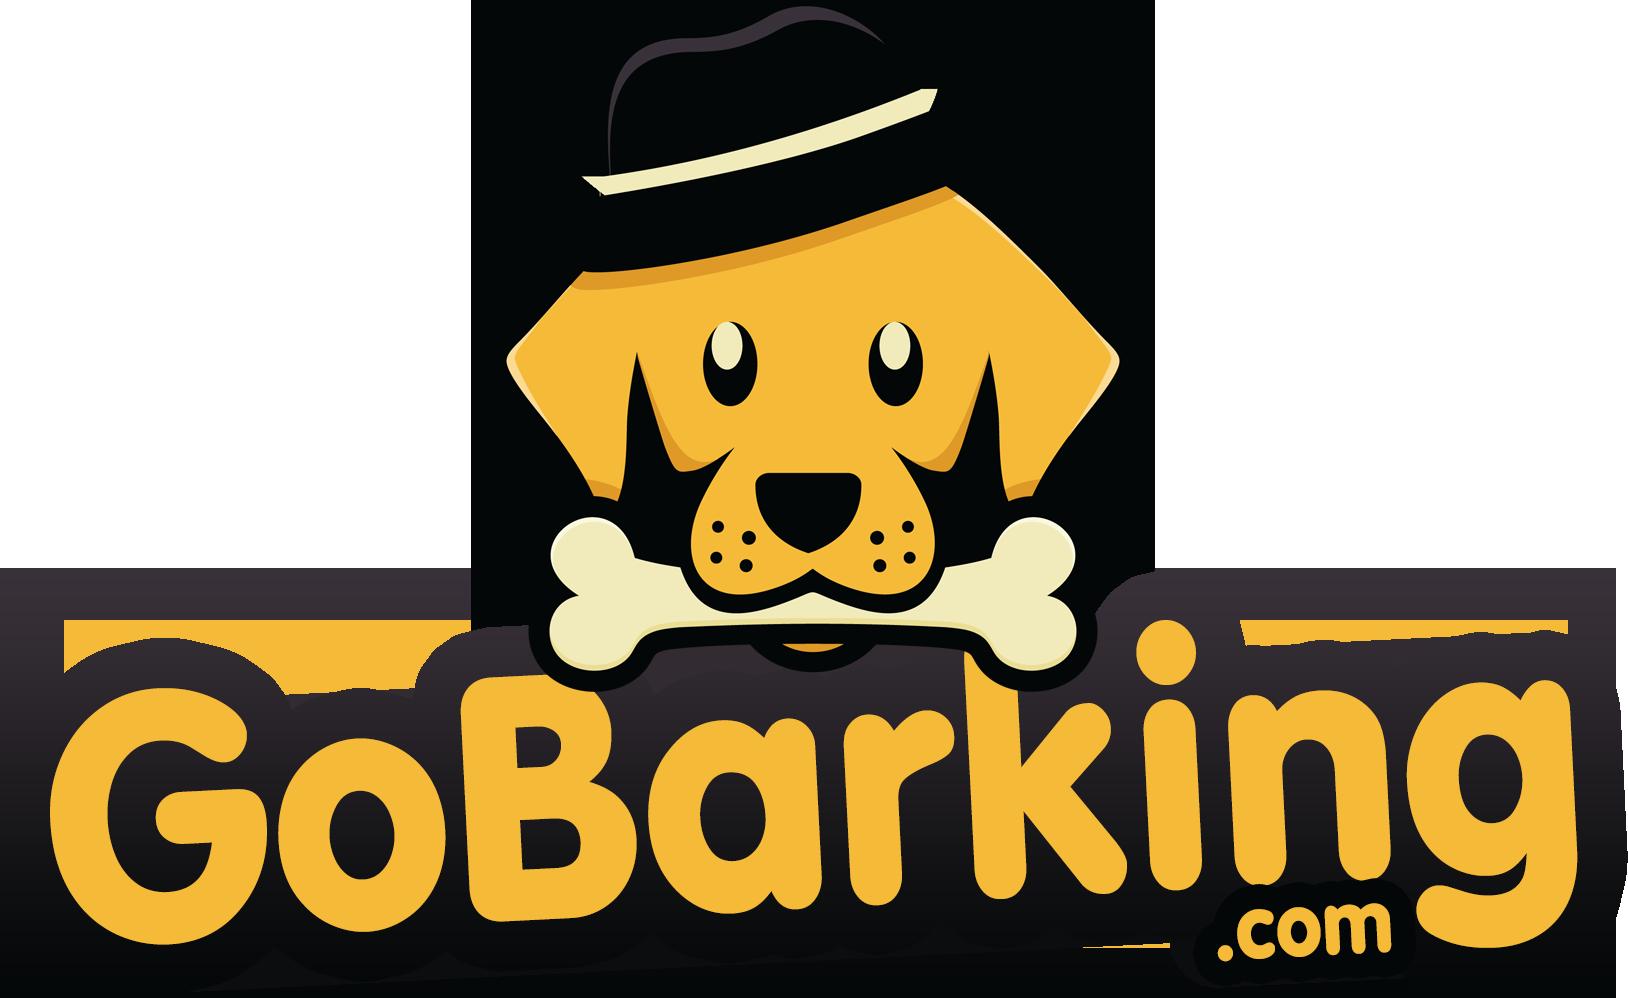 GoBarking.com